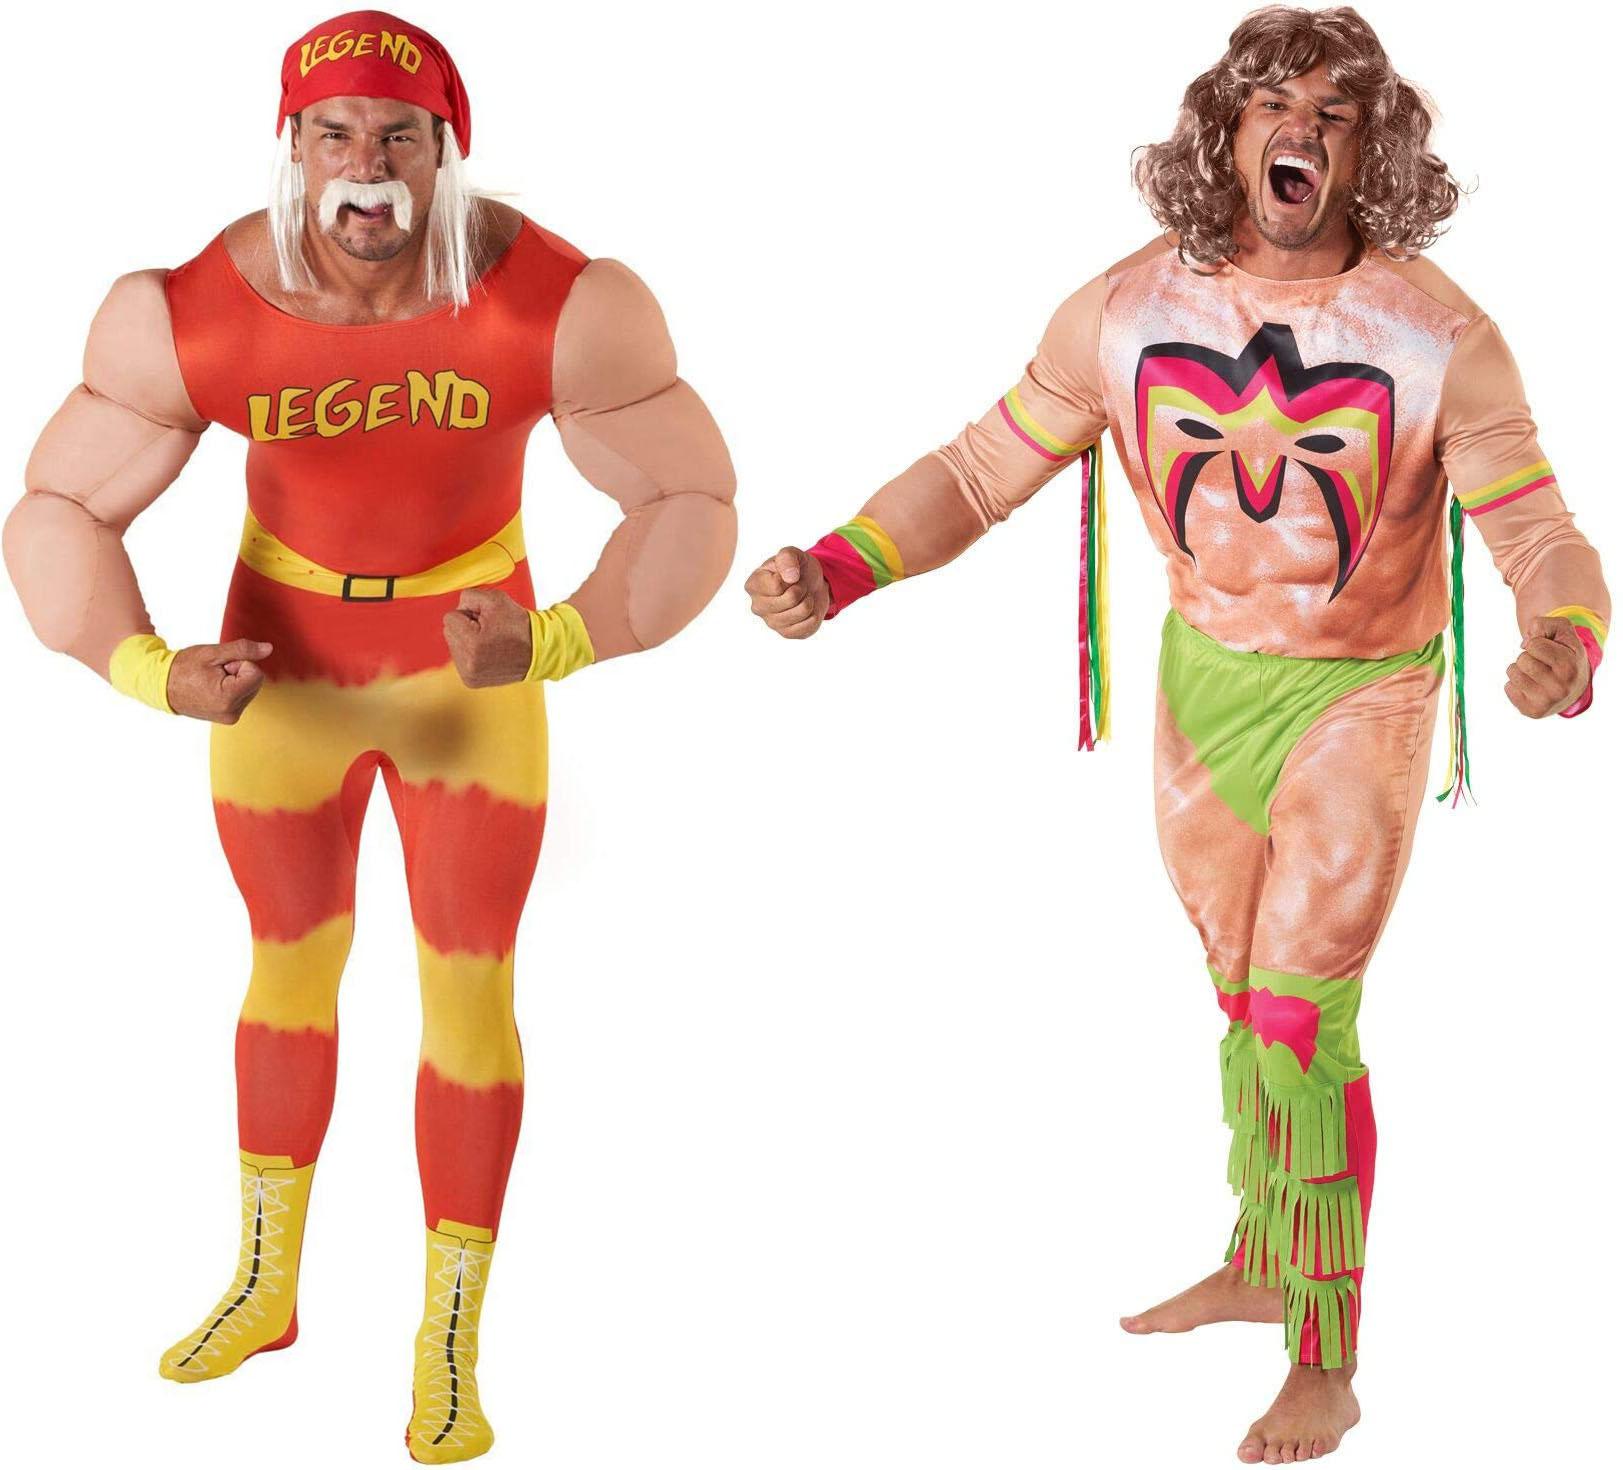 Costume halloween Hulk Hogan Ultimate Warrior